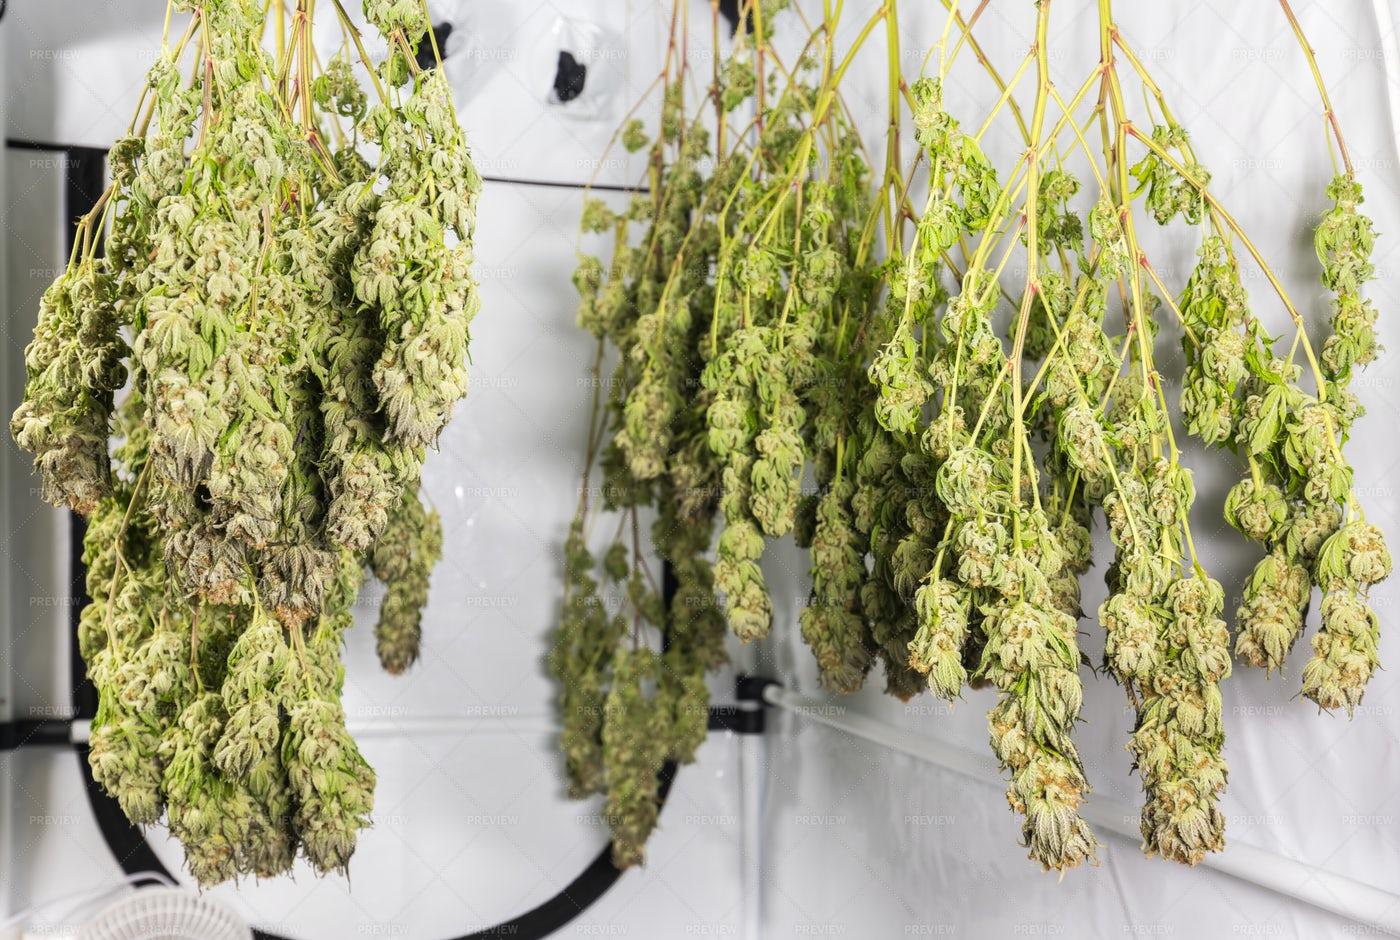 Drying Cannabis: Stock Photos